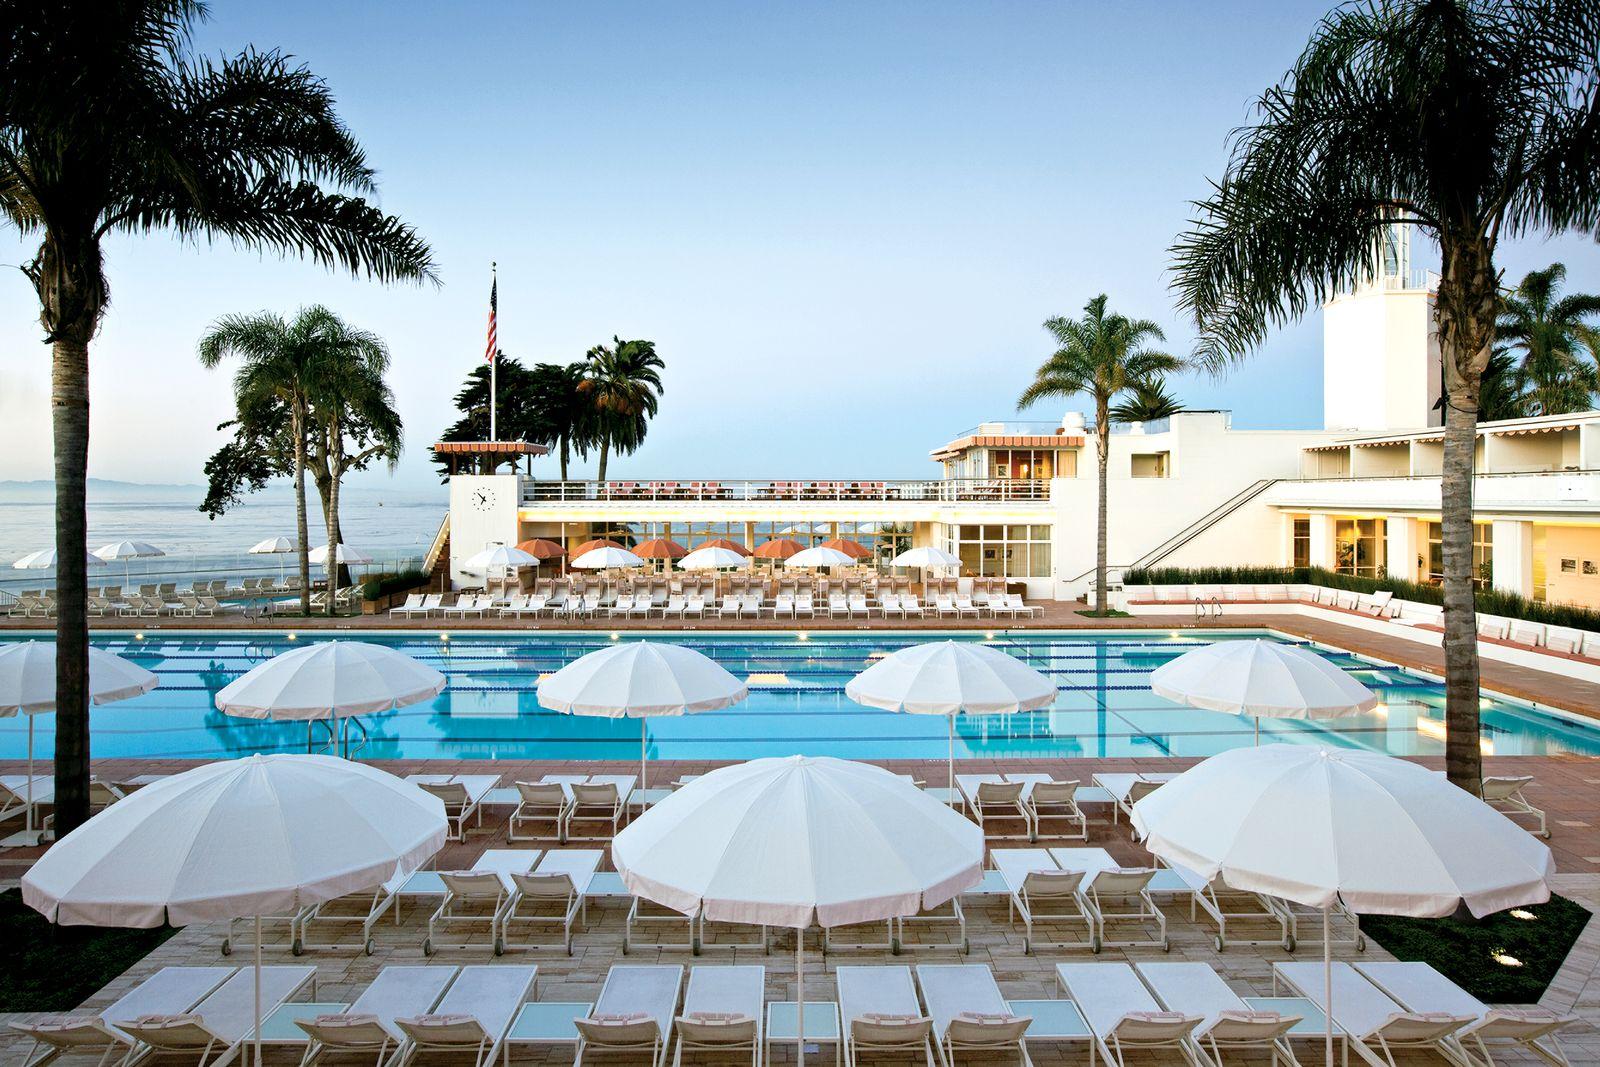 EINMALIGE VERWENDUNG Interview Jeff Bridges/ Four Seasons Resort The Biltmore